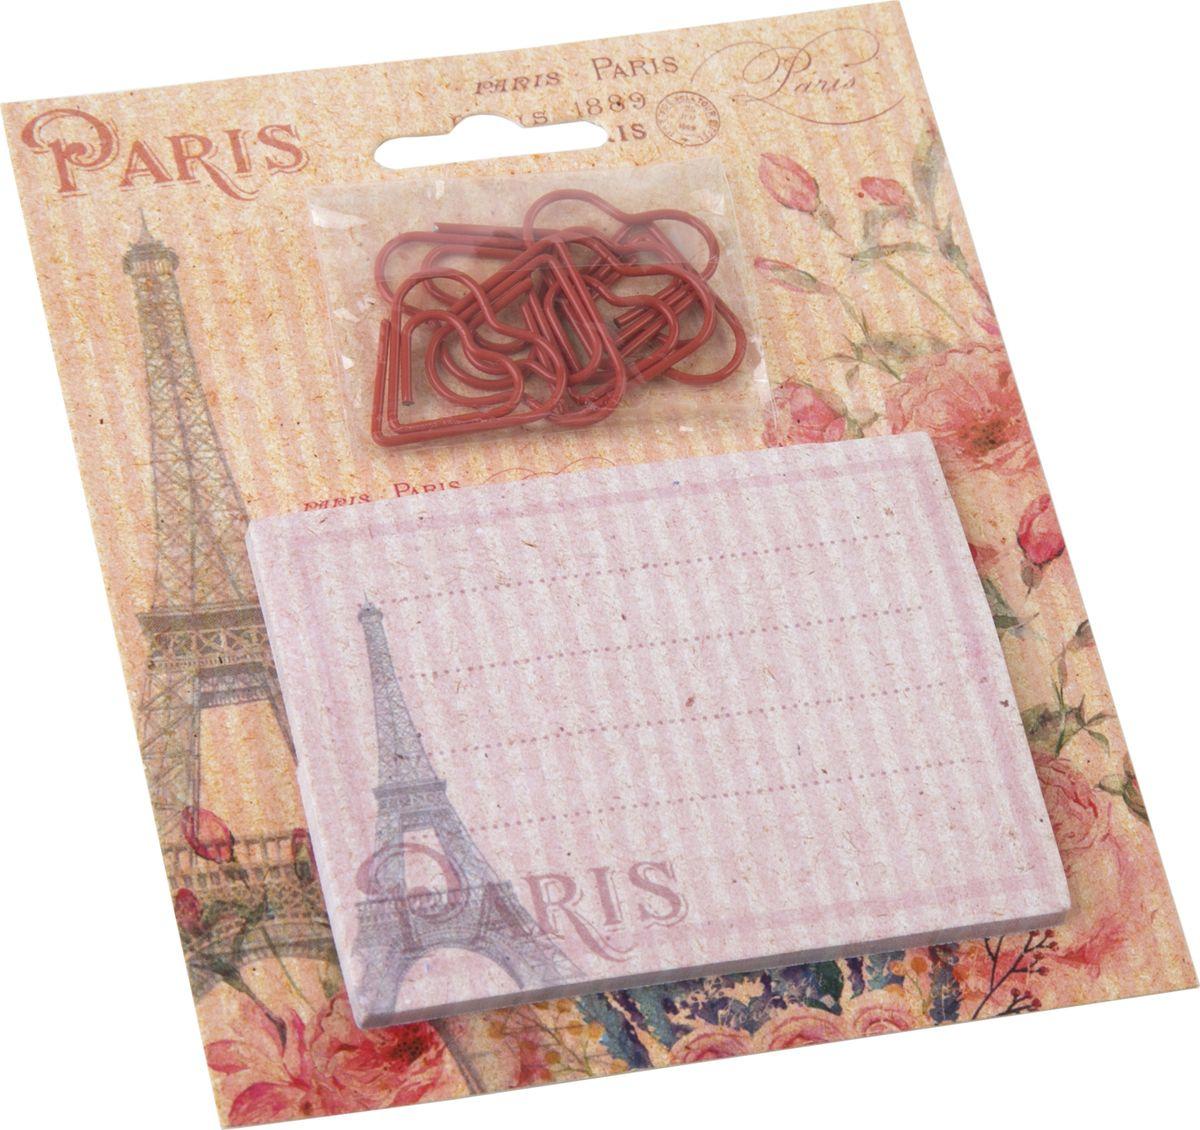 Фото - Канцелярский набор Magic Home Париж, 76728, 11 х 13 см канцелярский набор magic home птичья клетка 76727 11 х 13 см